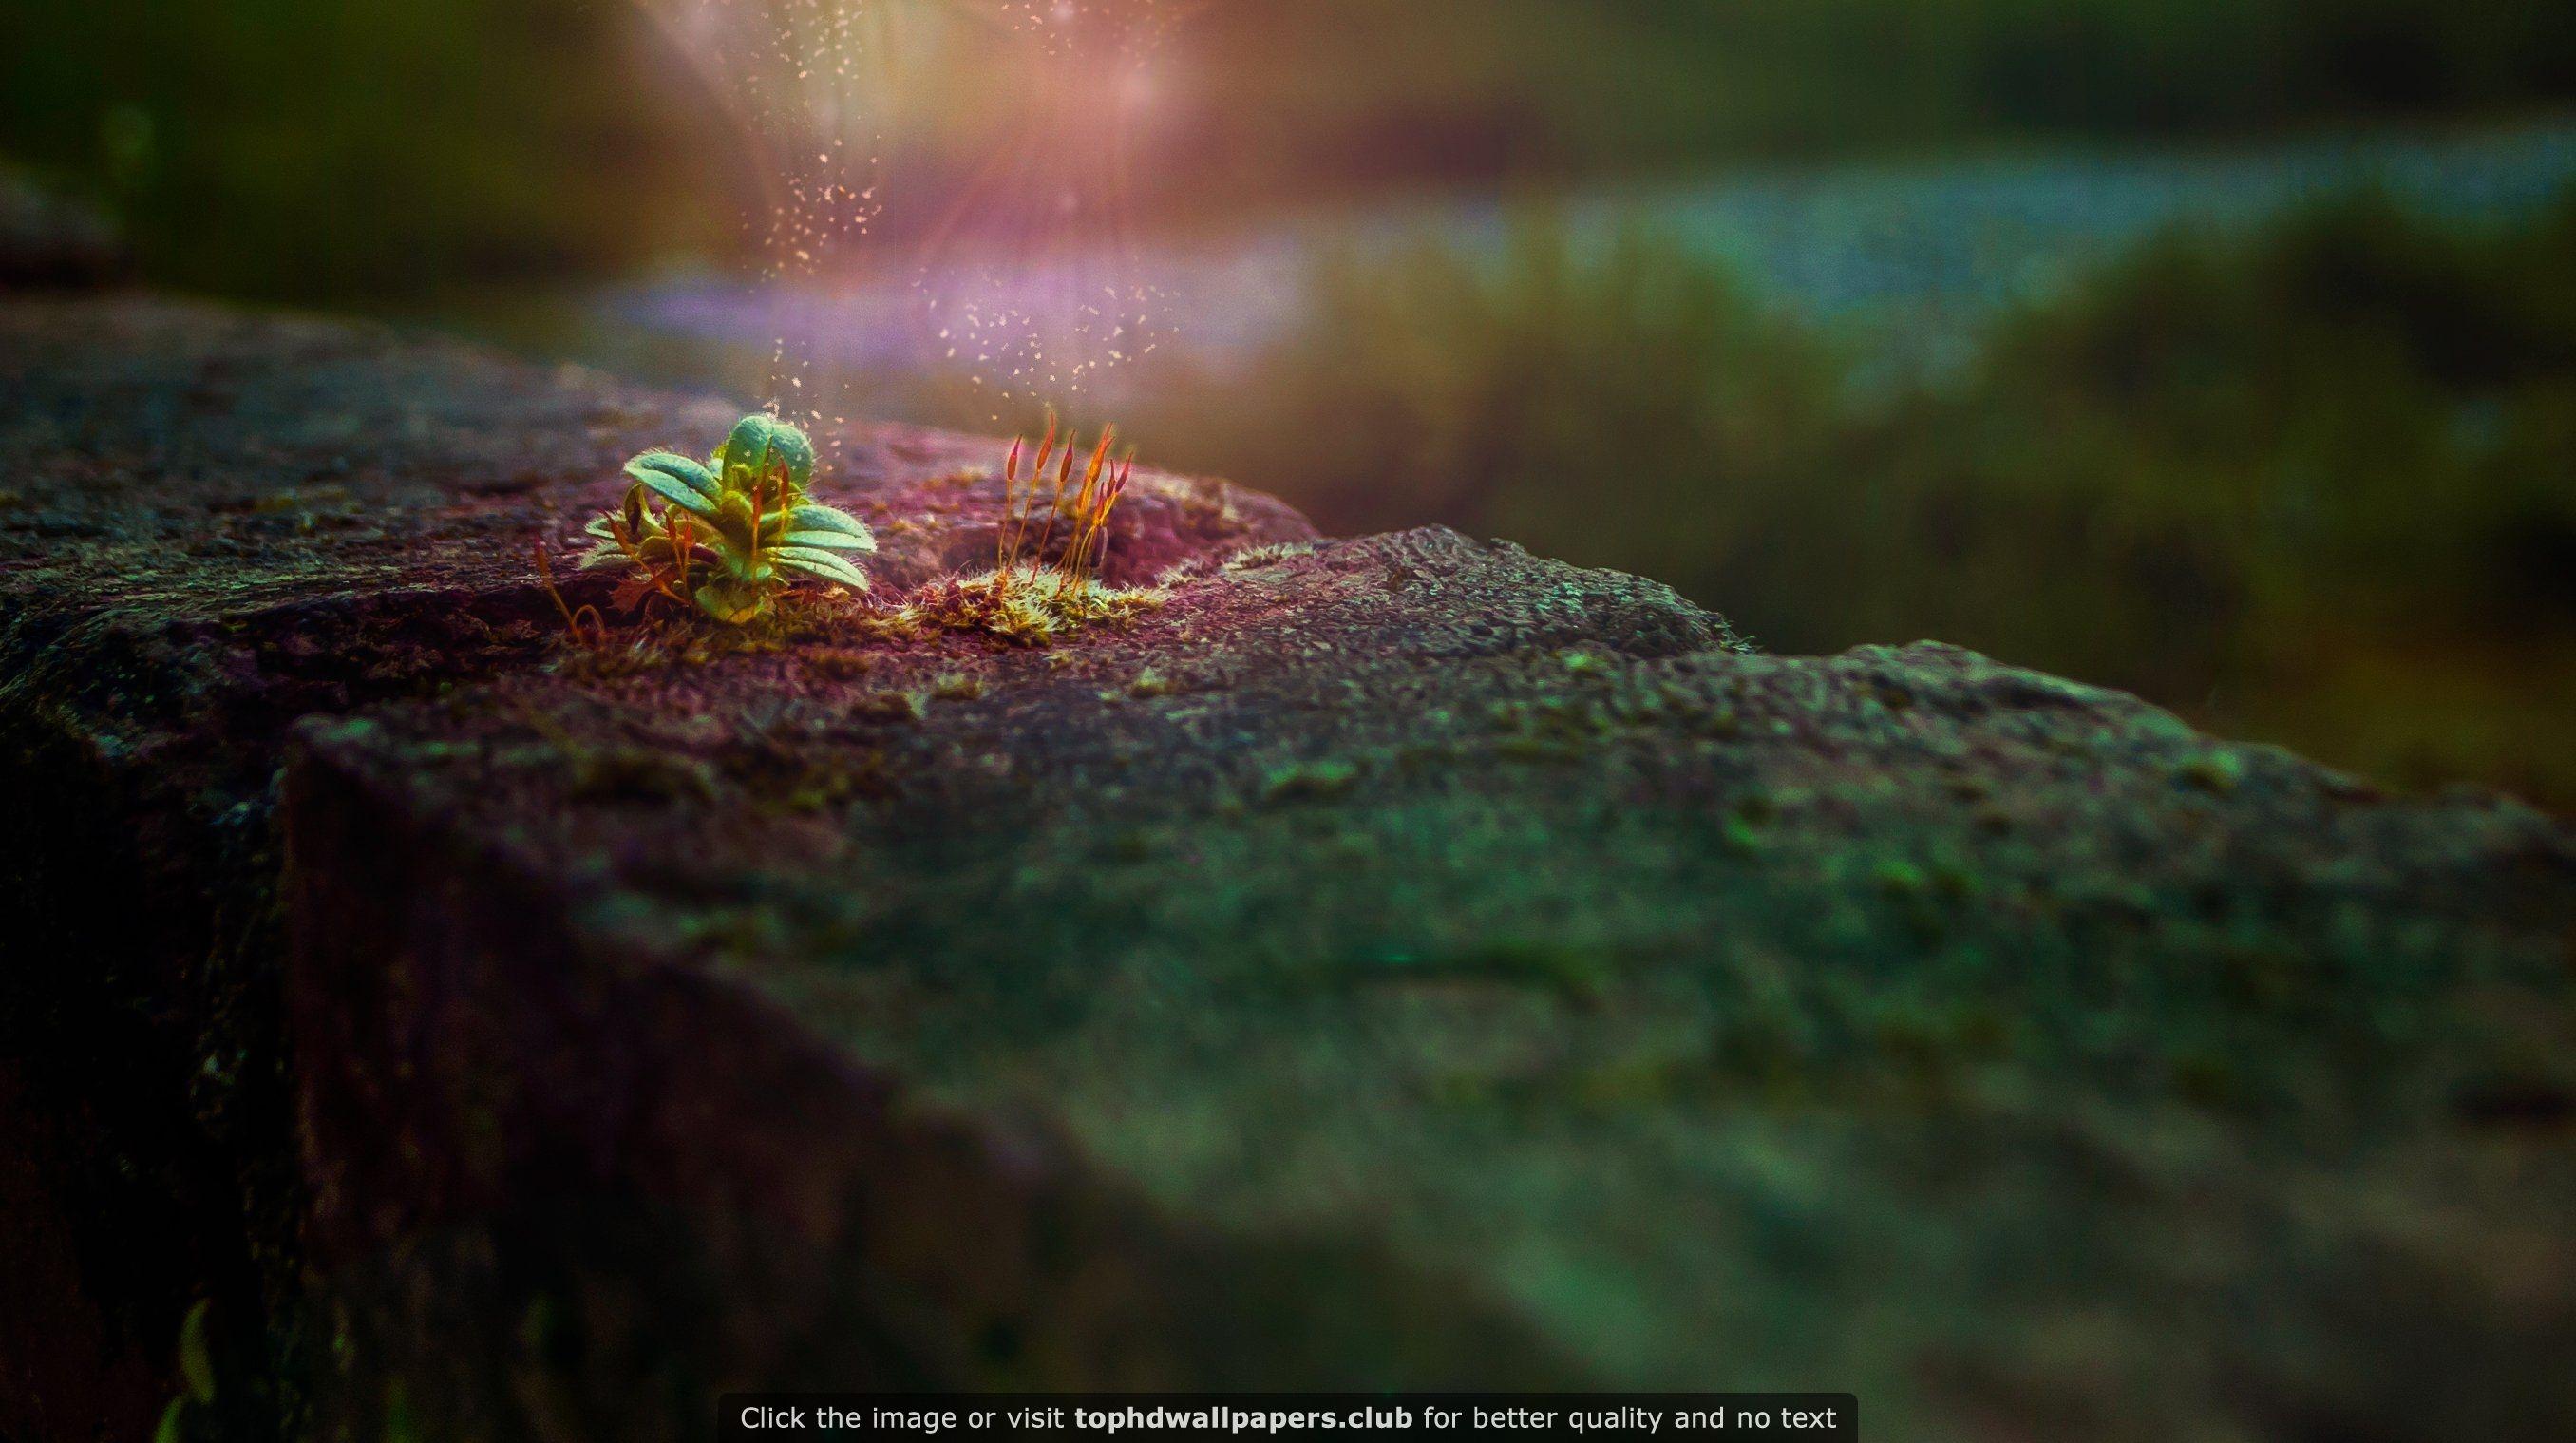 4k Hd Wallapaper: Plants Bricks Magic 4K Or HD Wallpaper For Your PC, Mac Or